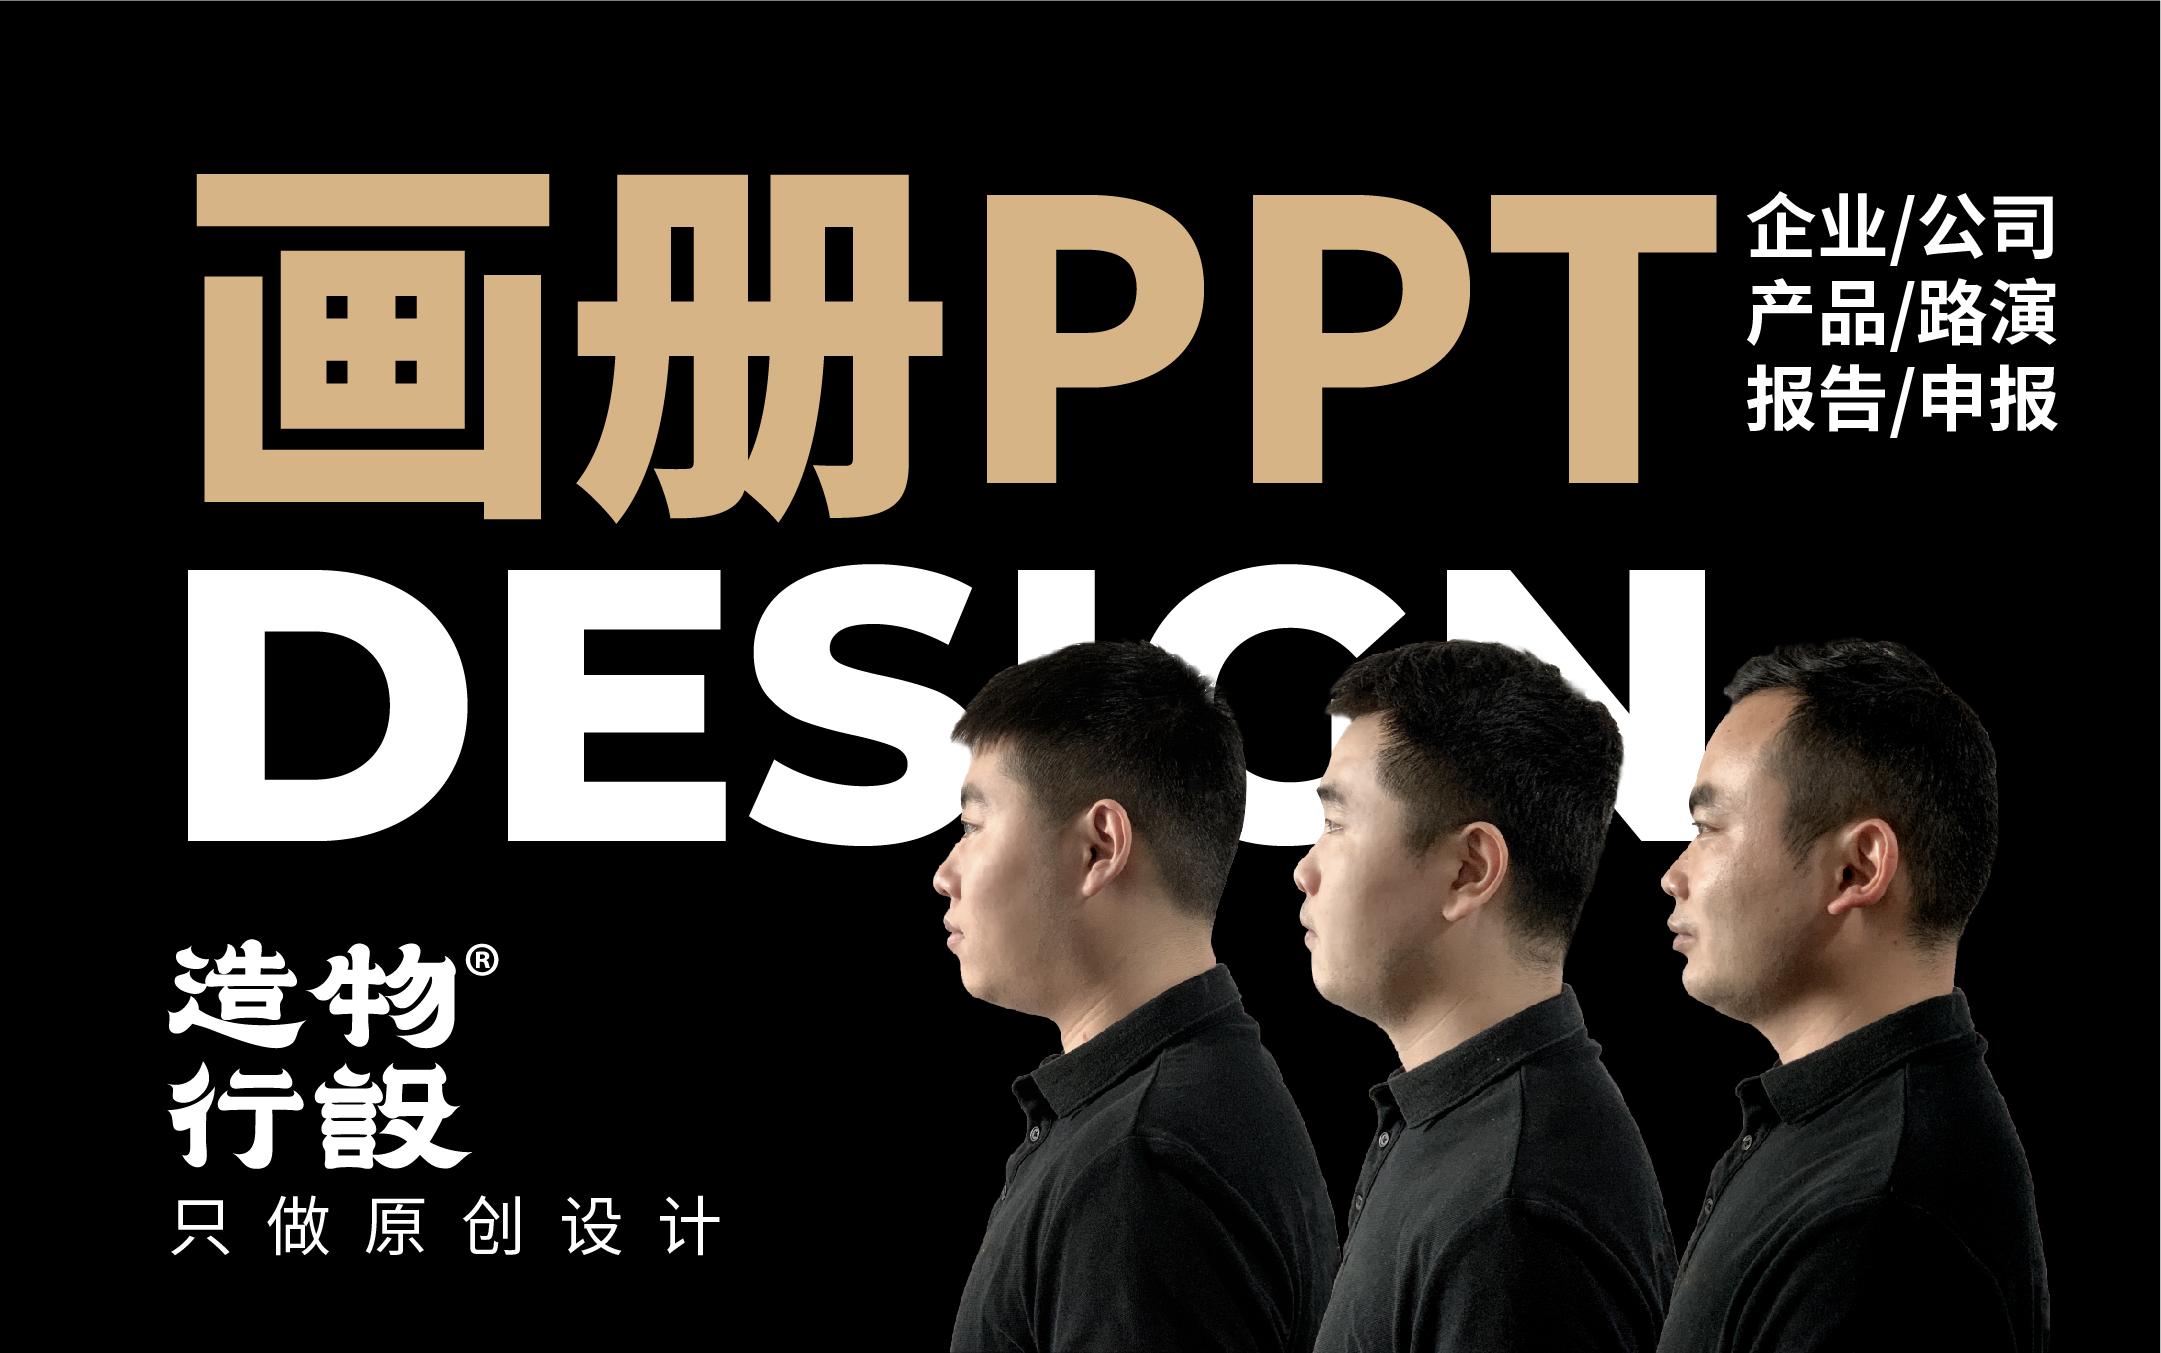 PPT设计制作美化招商汇报课件路演宣传发布会简历优化模板定制